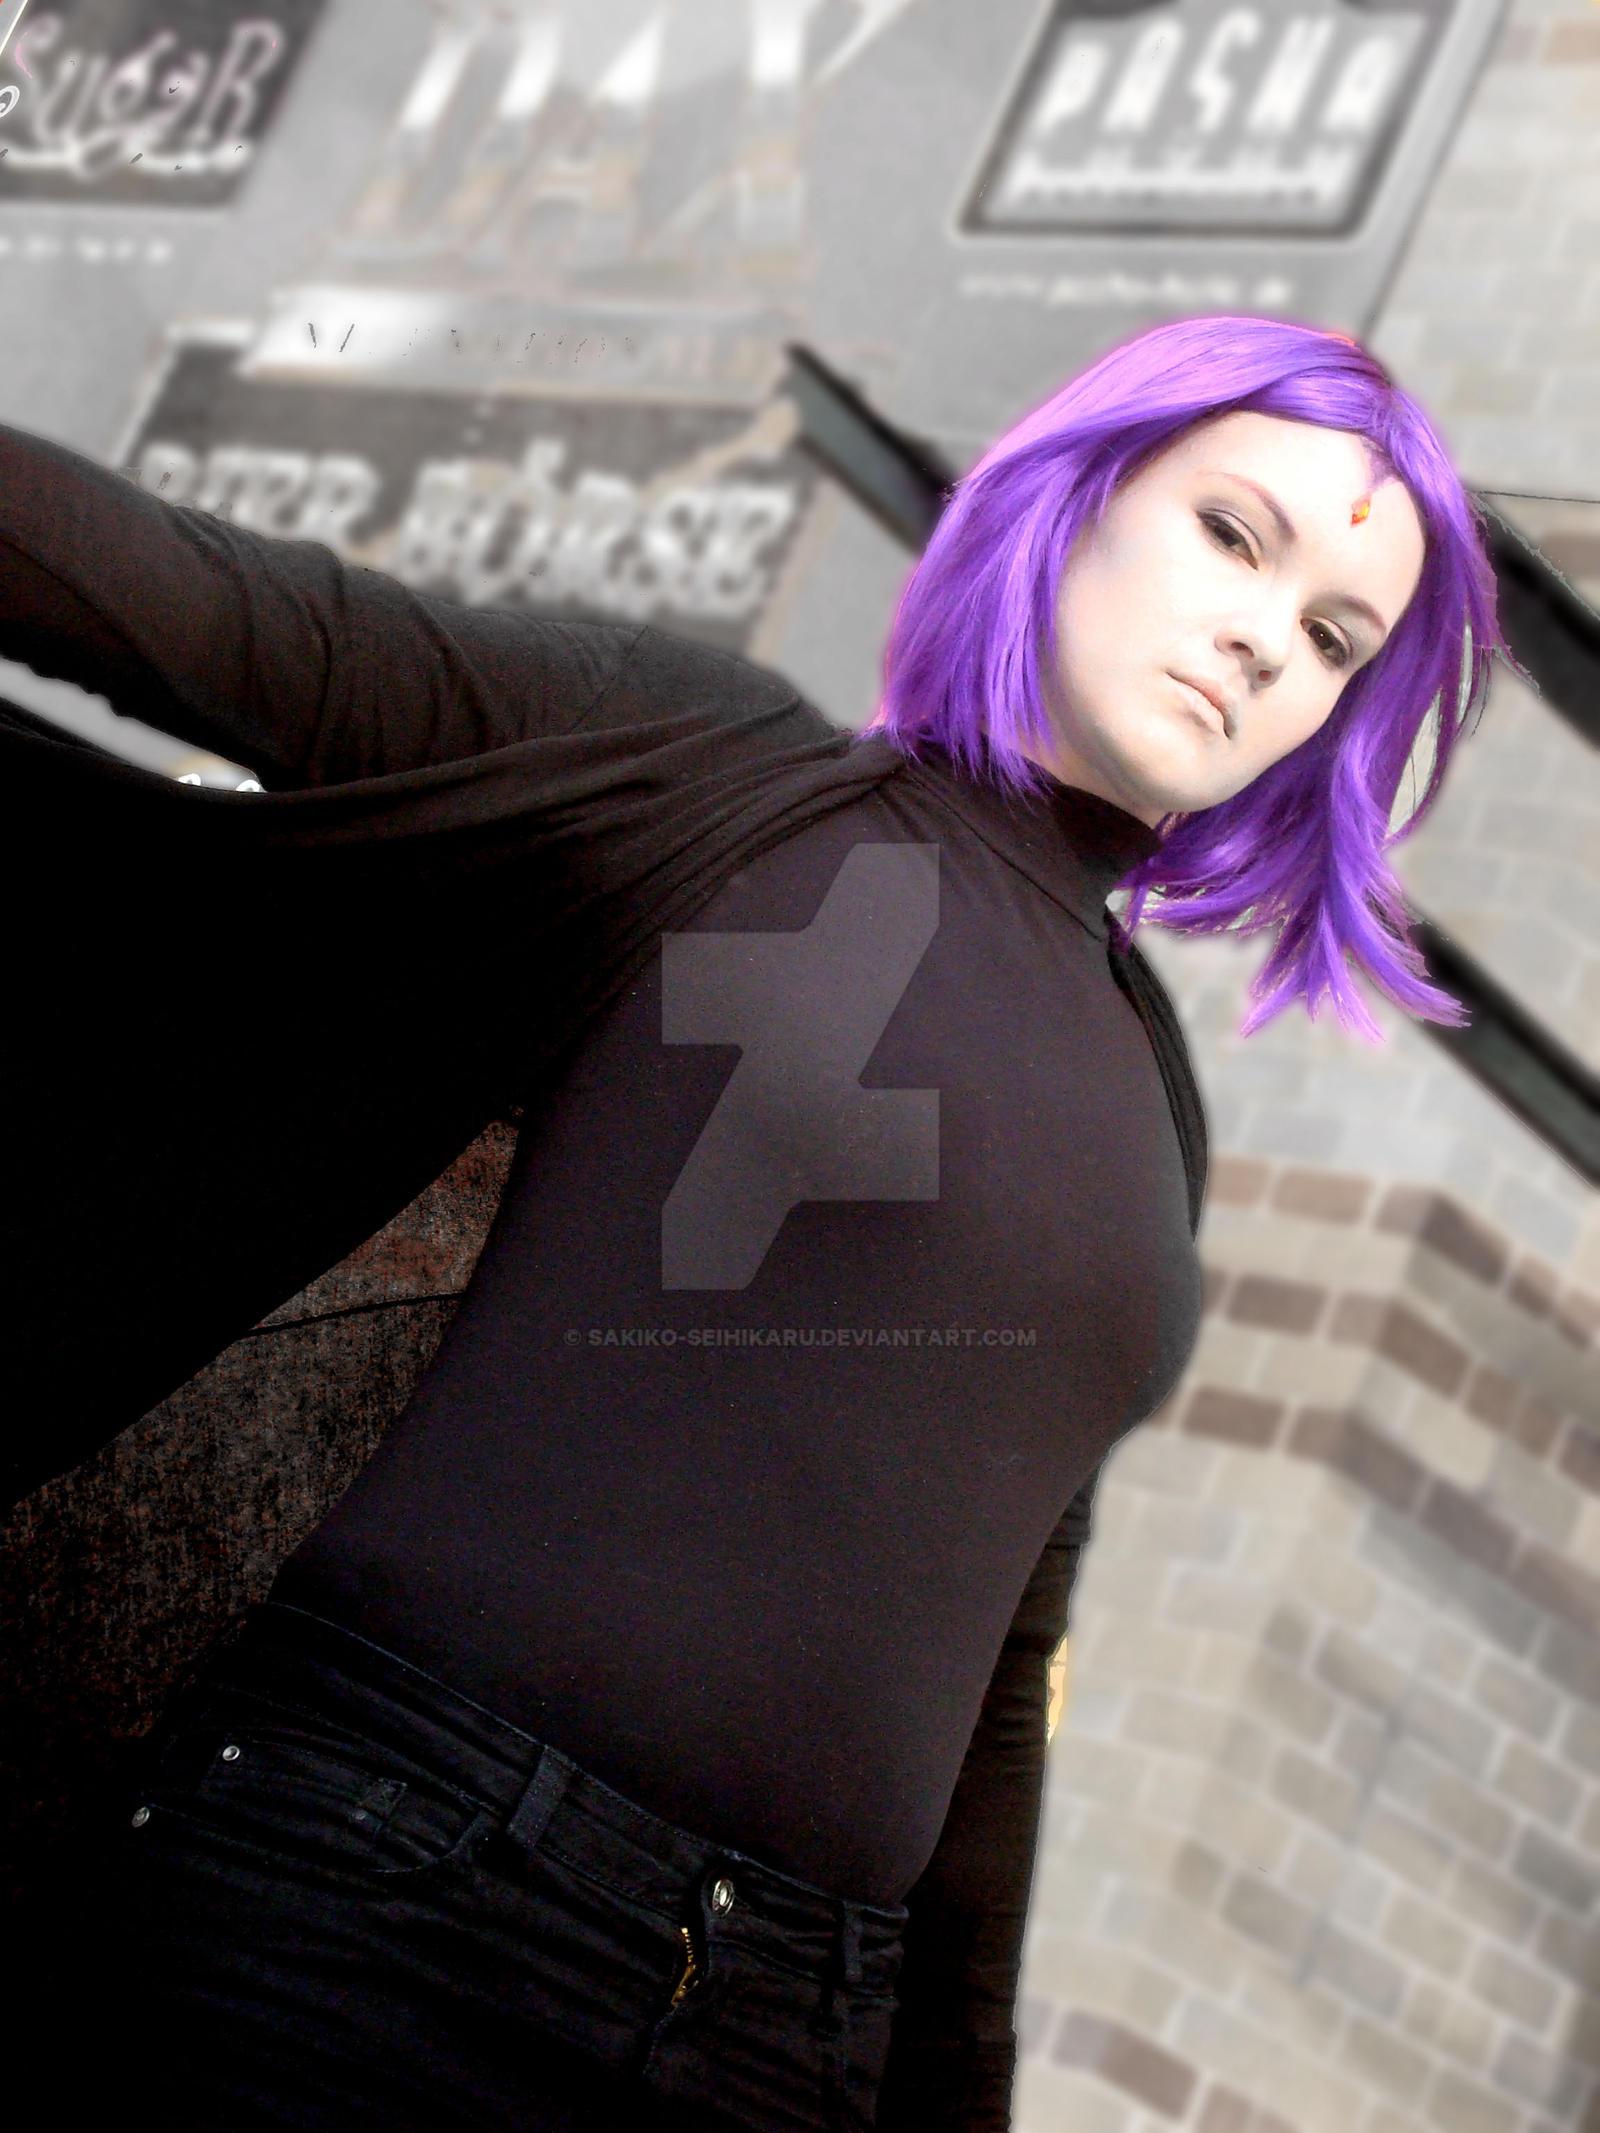 Teen Titans - Raven I by Sakiko-Seihikaru